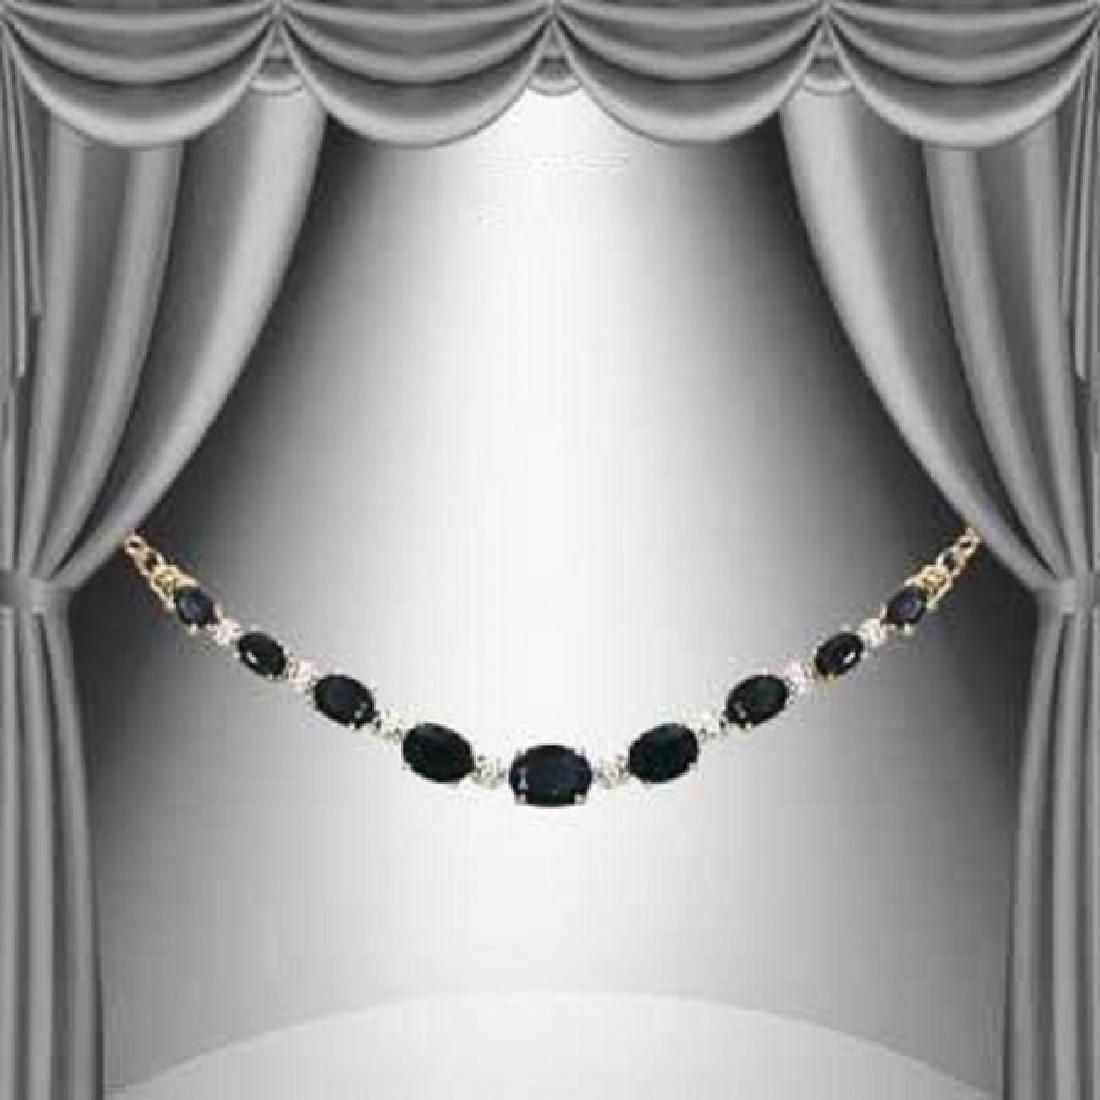 11.27 CT Black Sapphire & Diamond Necklace $1580